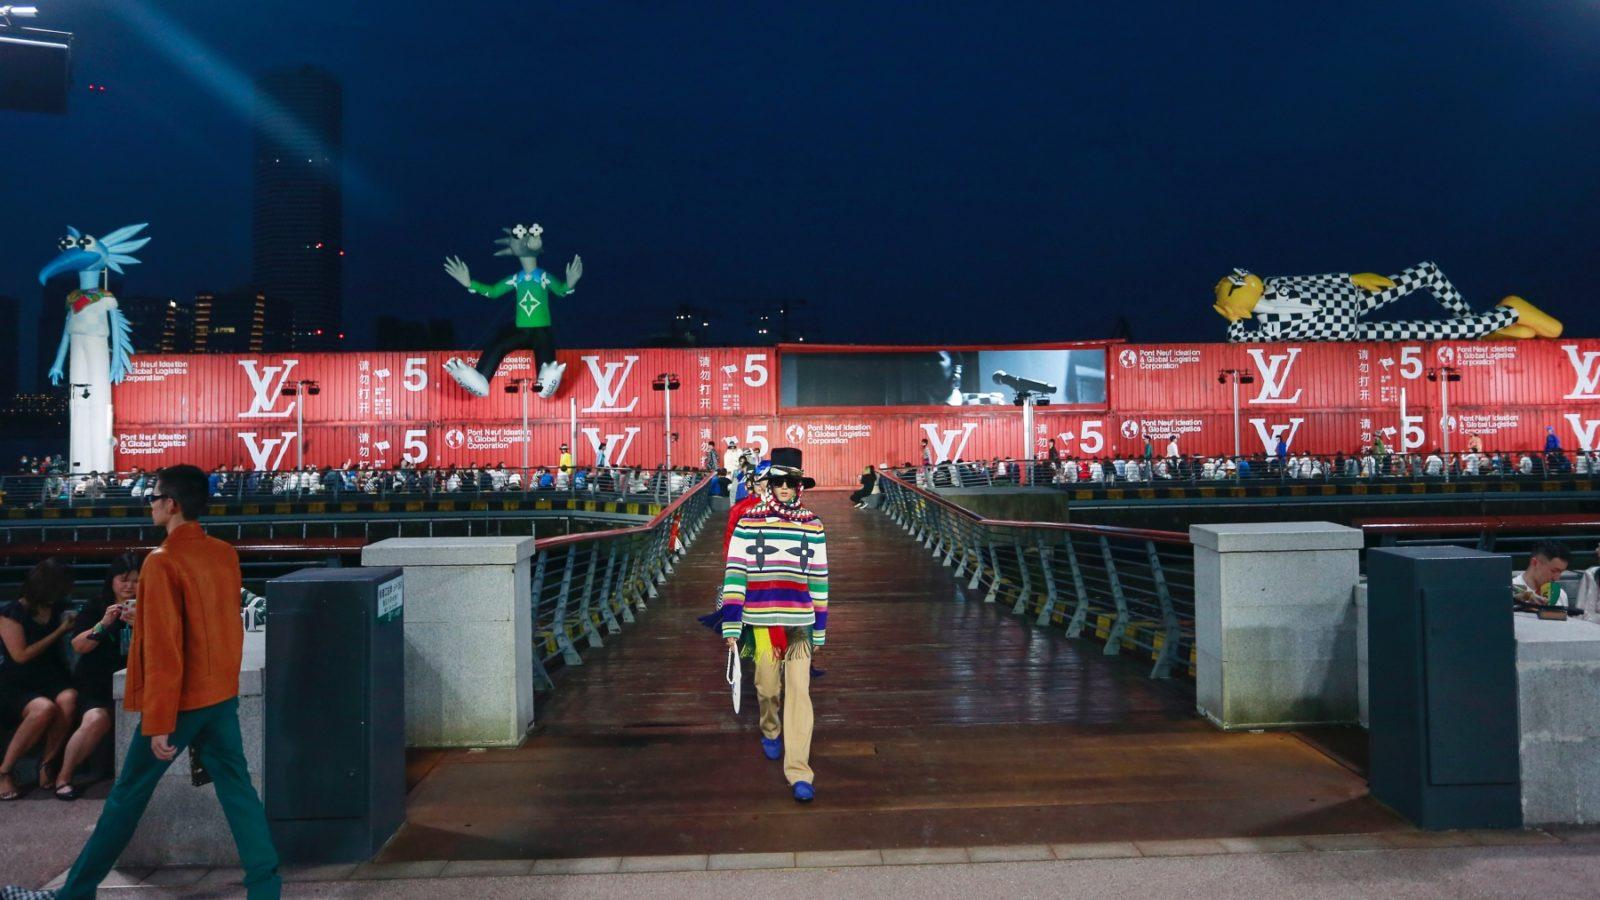 Louis Vuitton's SS21 menswear show is a manifesto for progressive change